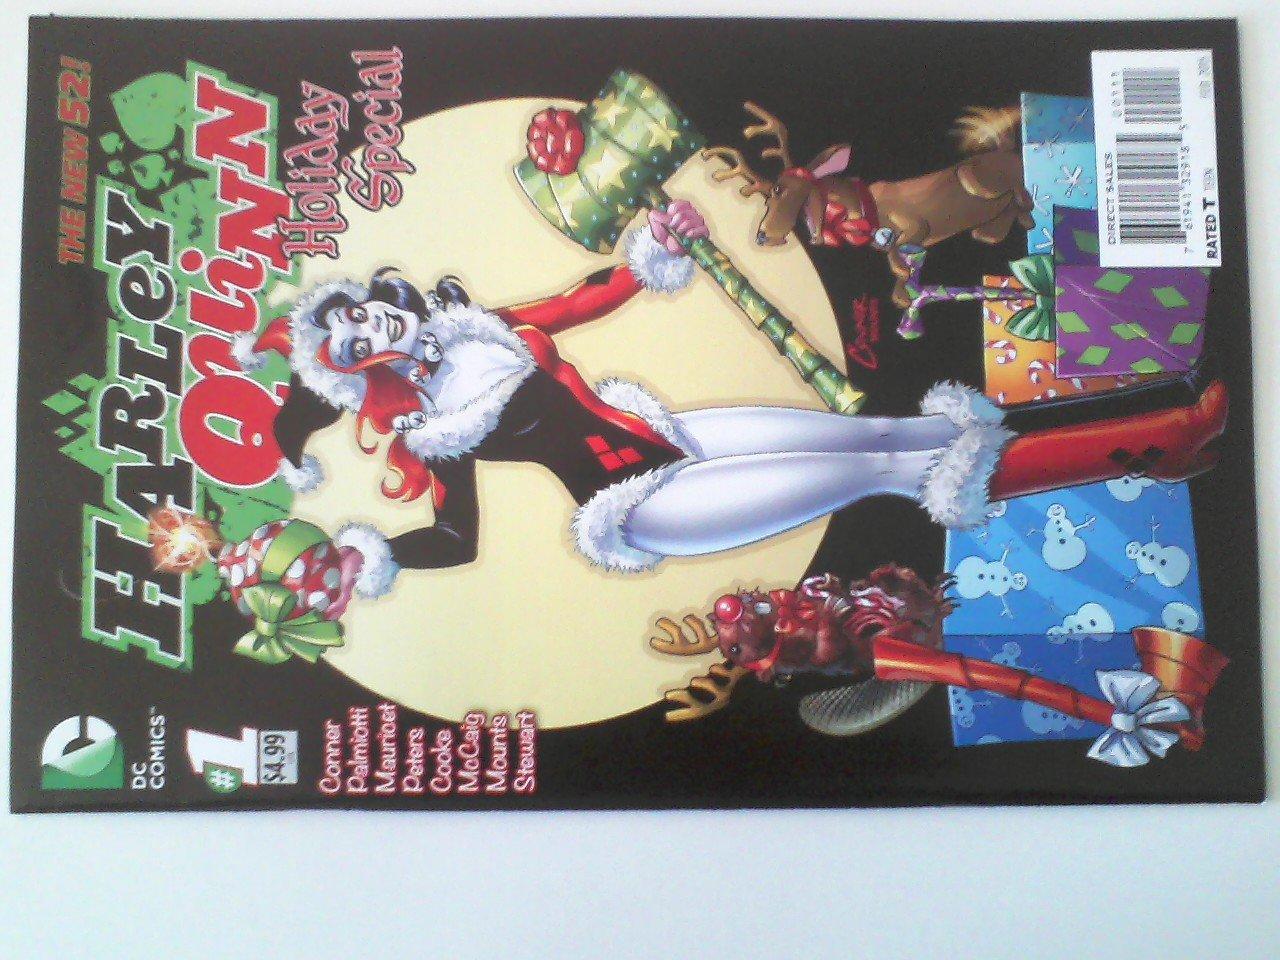 Harley Quinn Holiday Special #1 ,Hitman #16